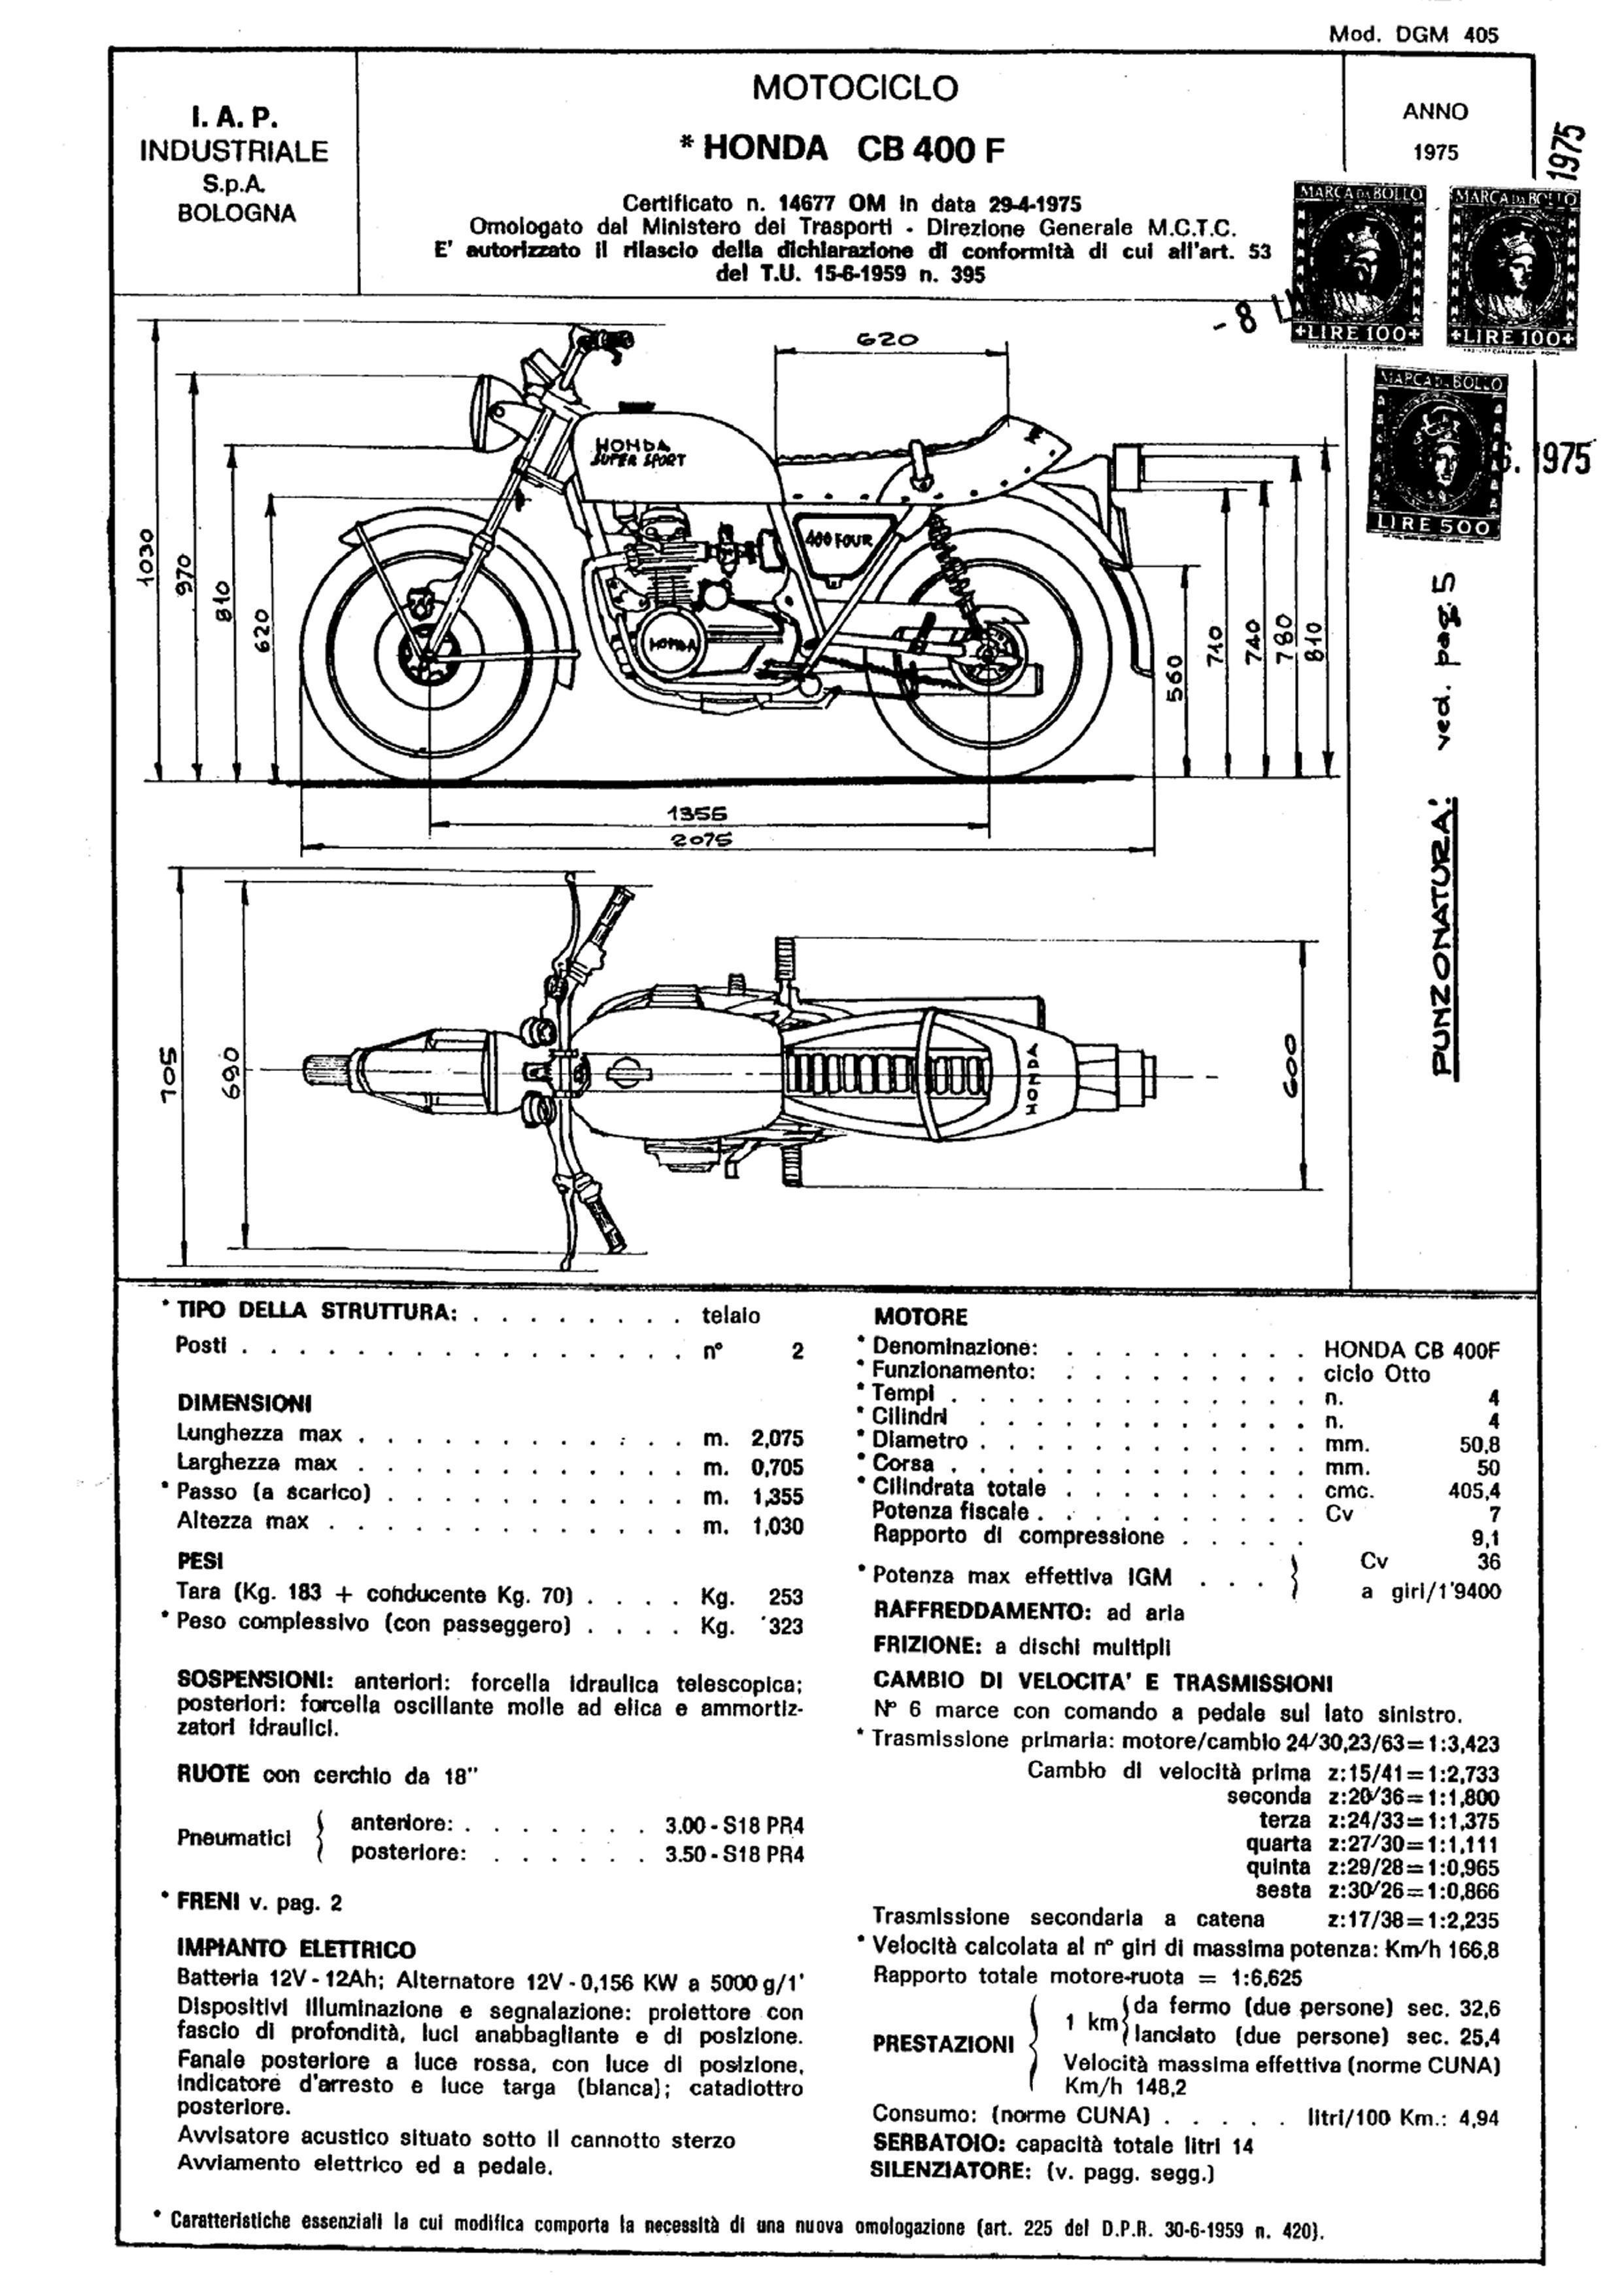 Conformity Declaration CB400F (Italian) (1975)